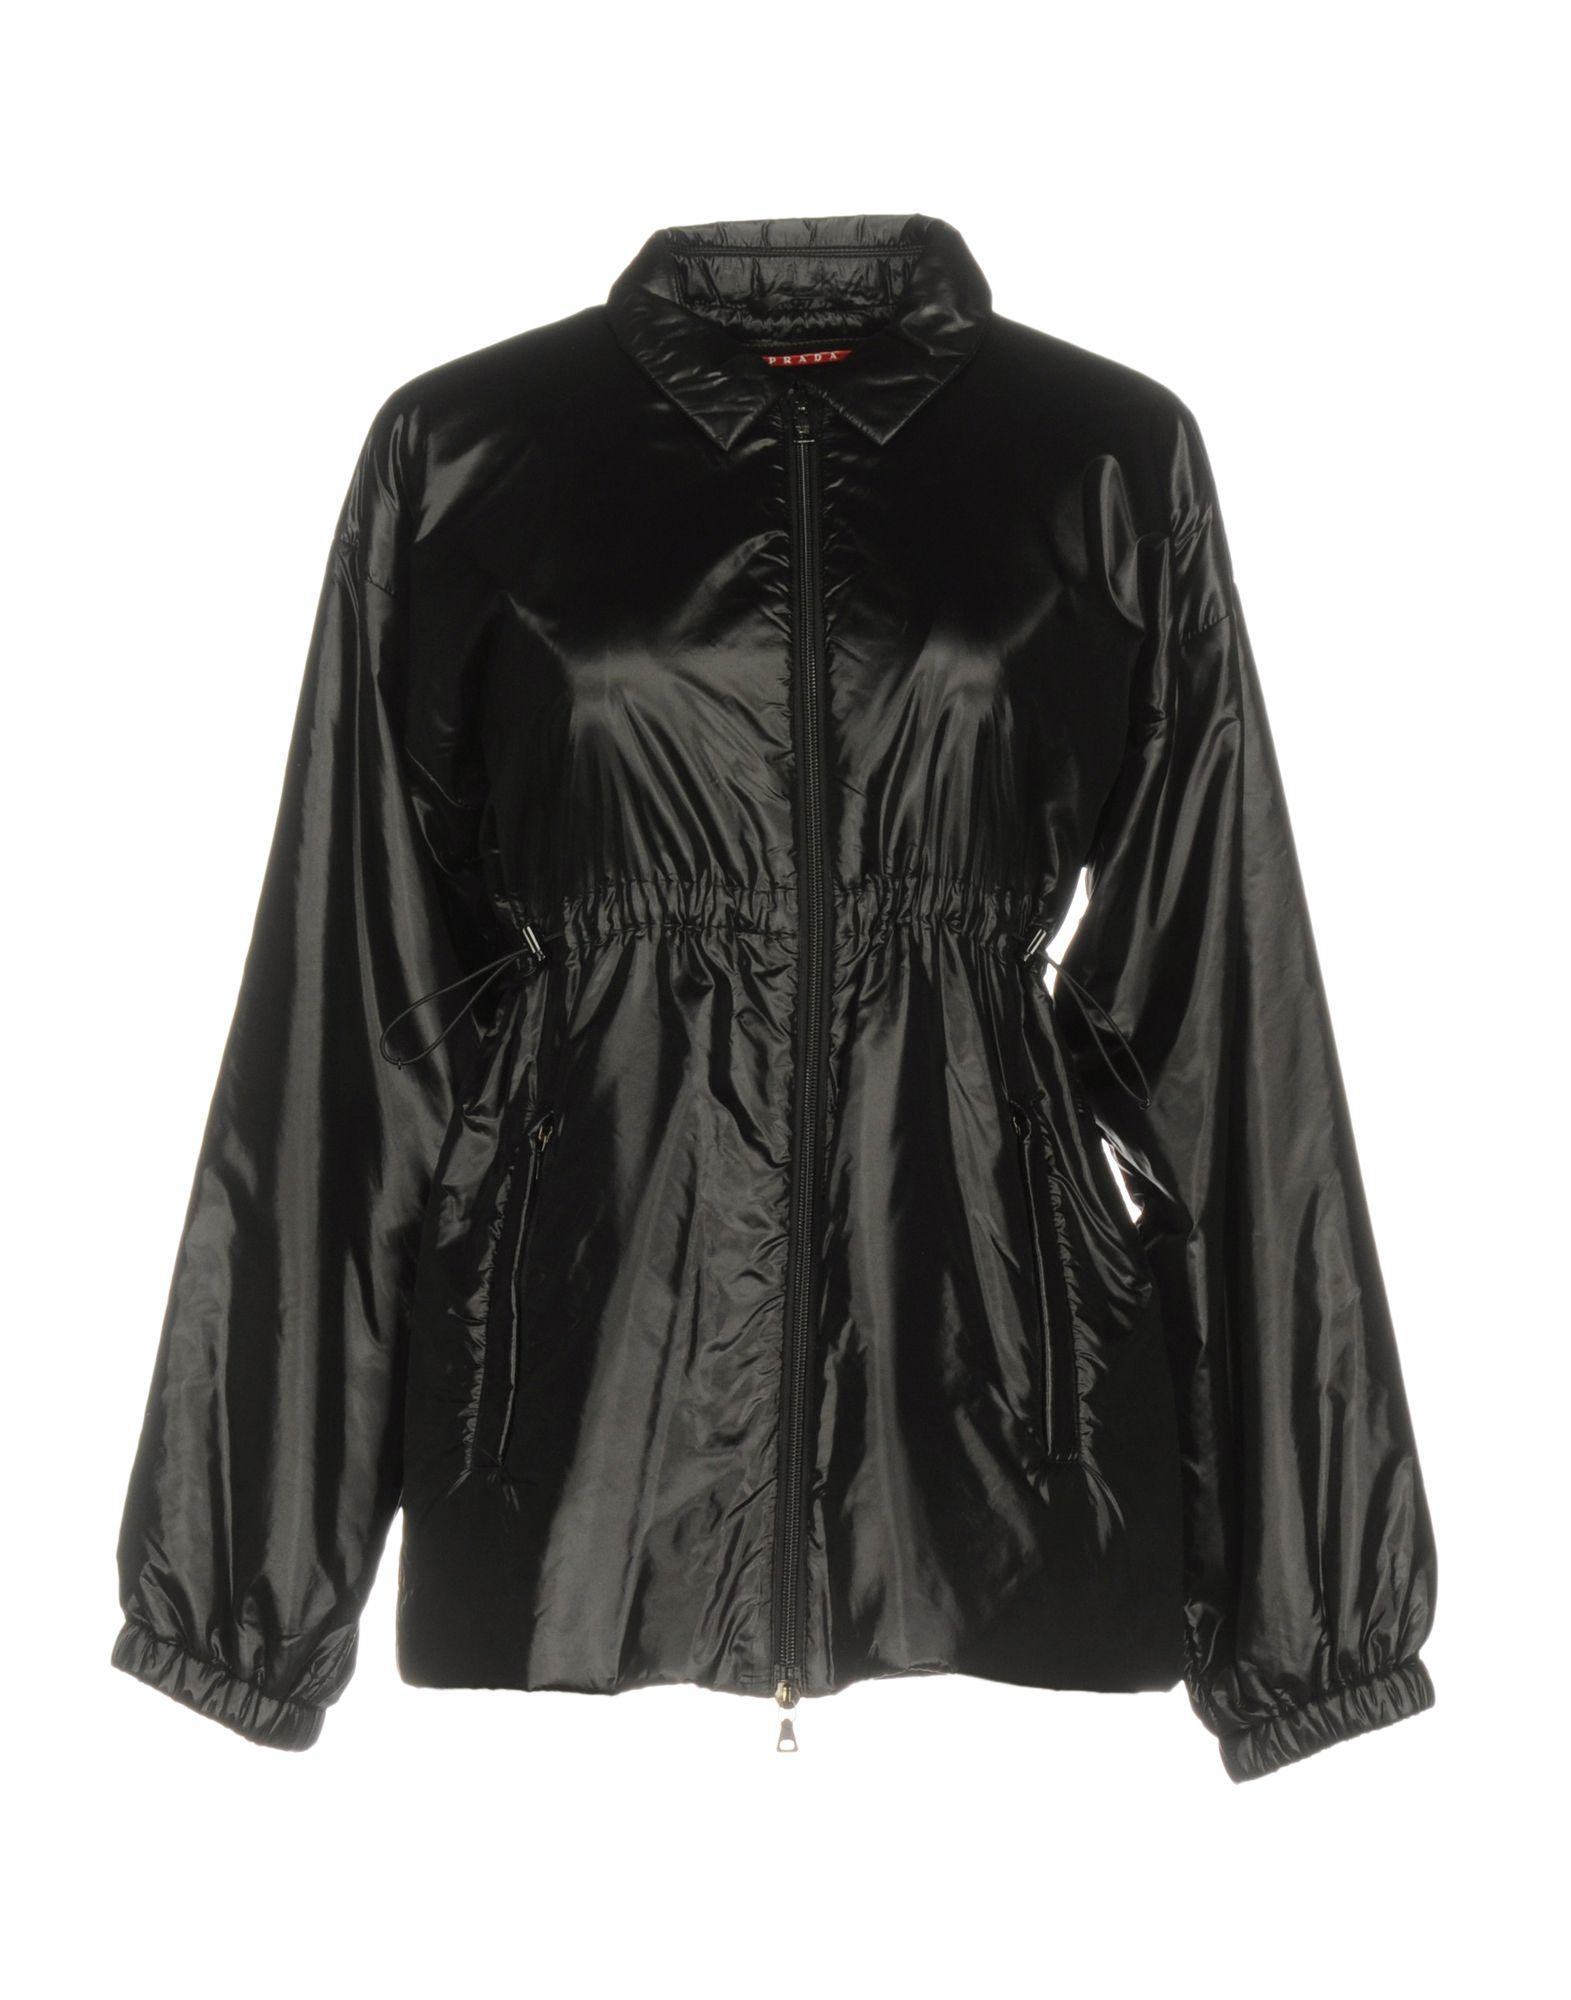 PRADA SPORT Damen Jacke Farbe Schwarz Größe 3